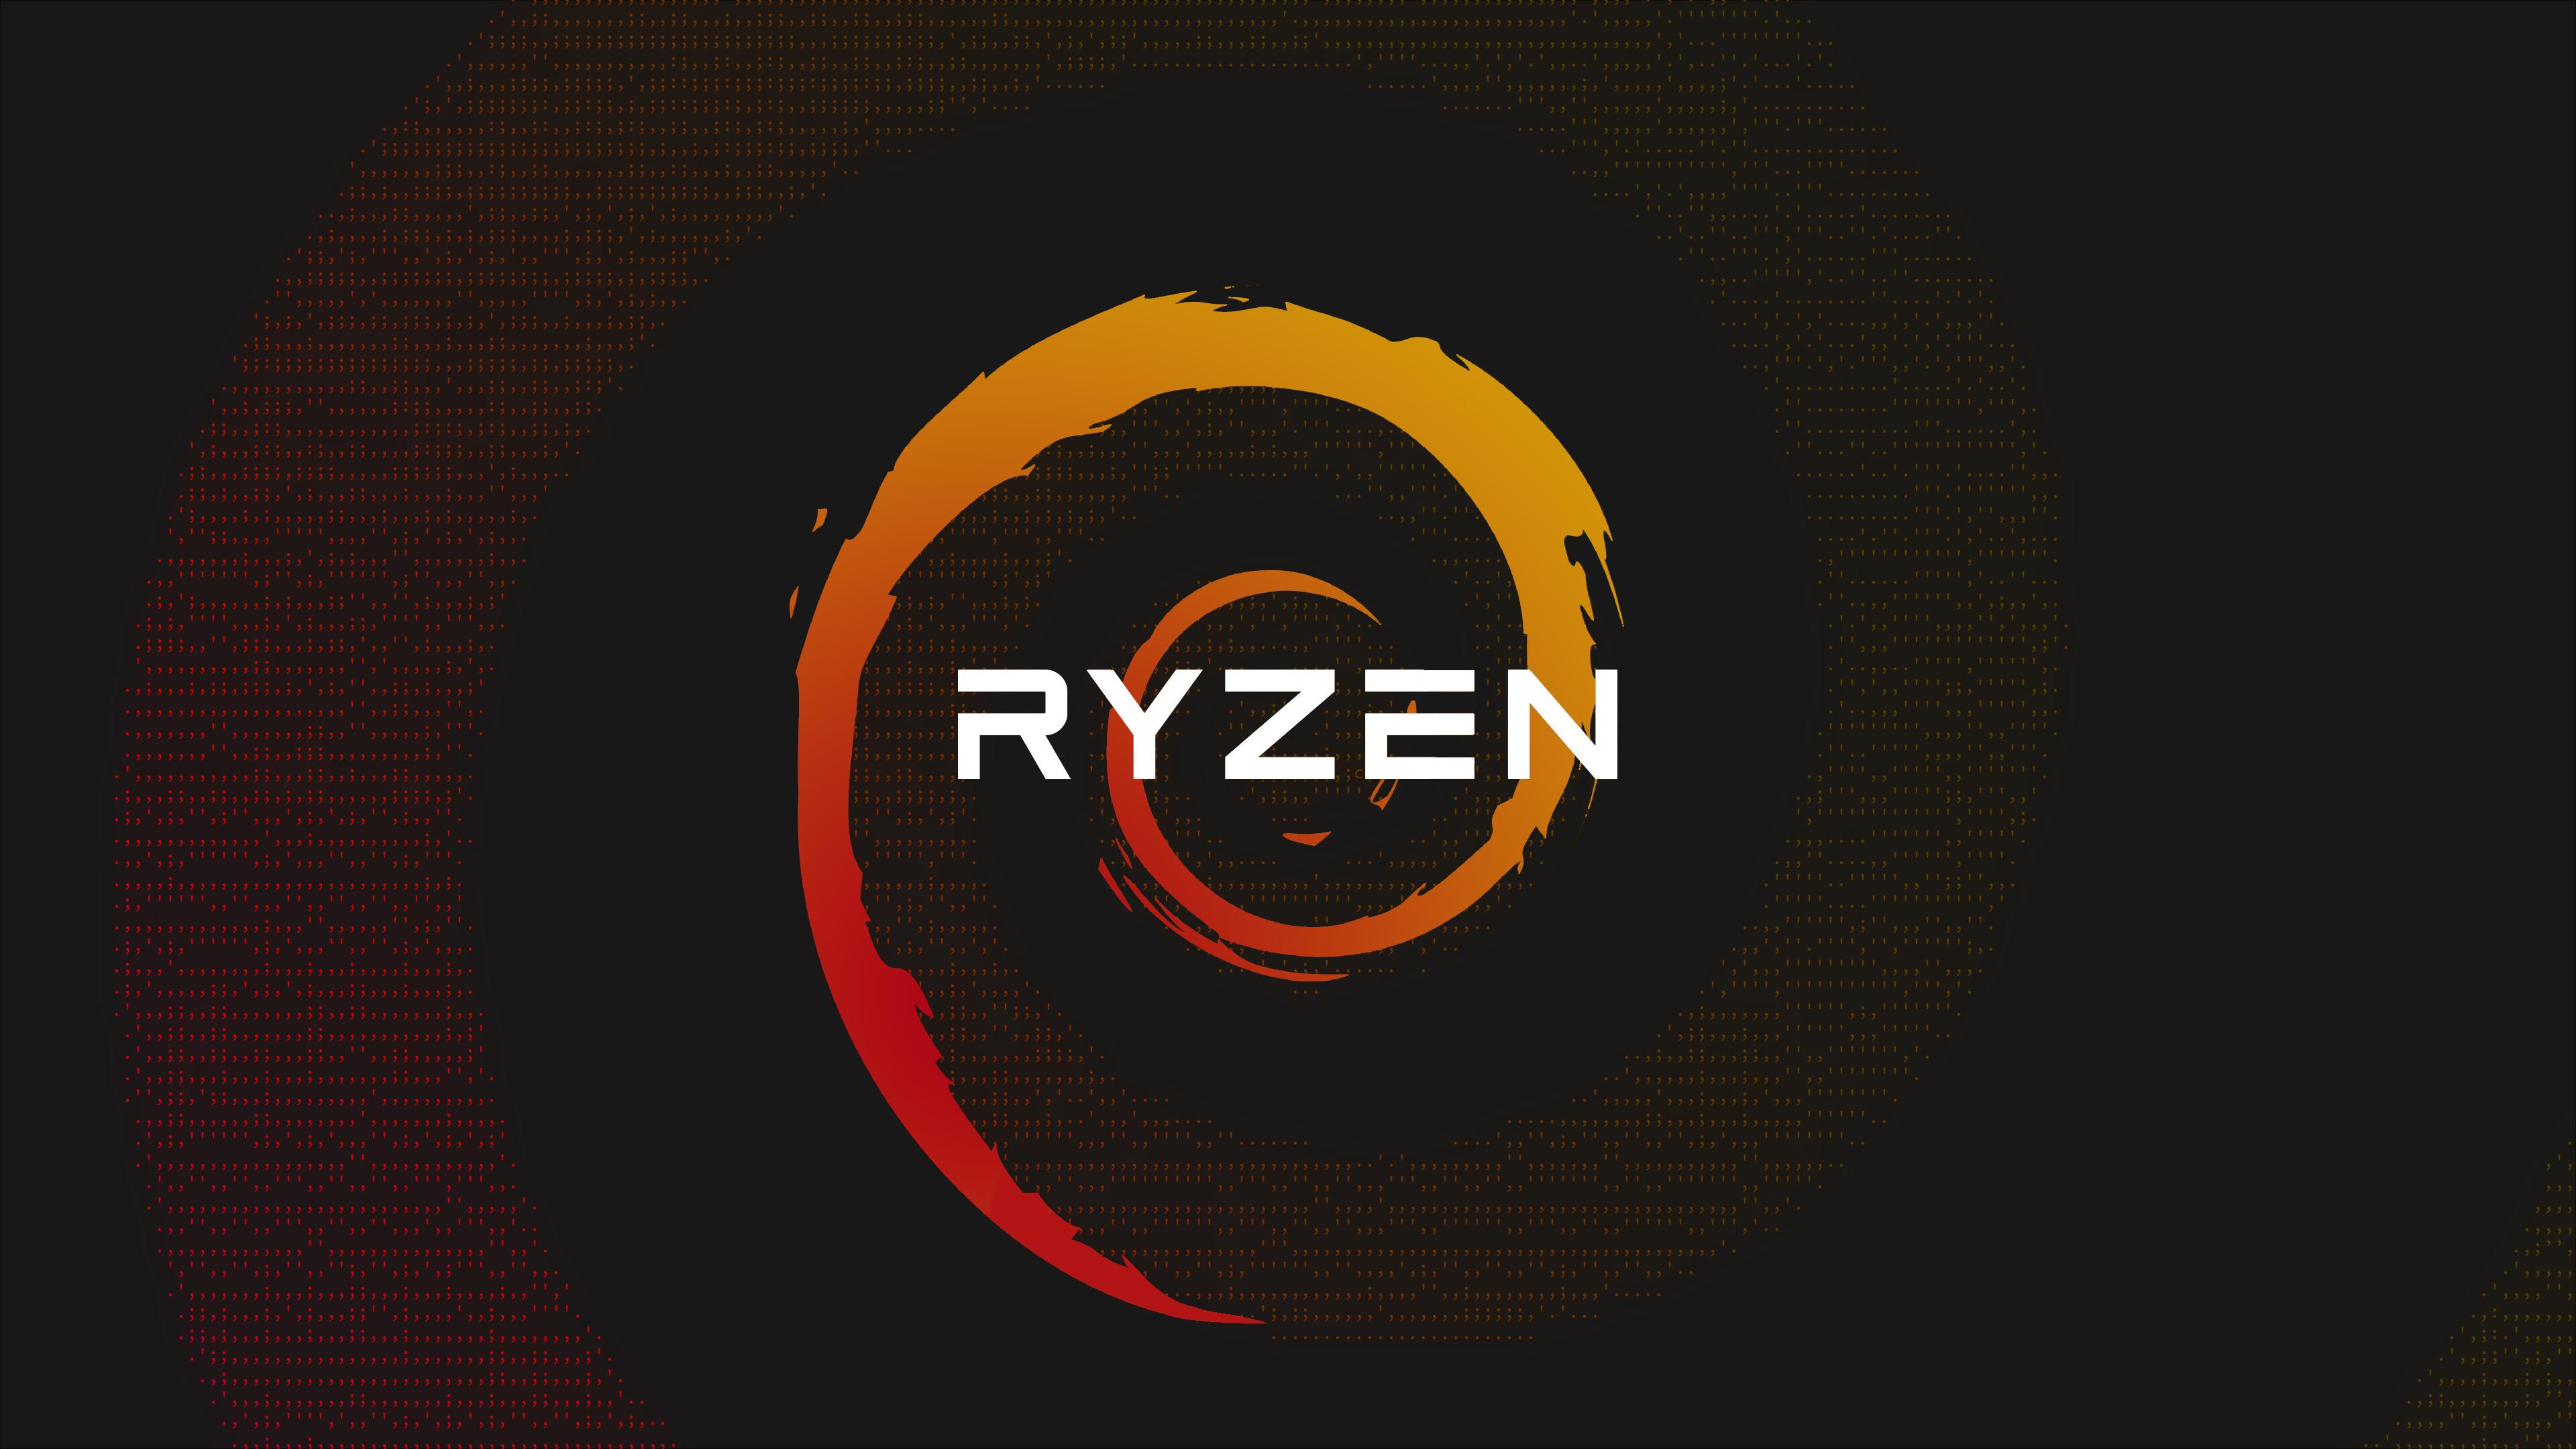 Wallpaper Ryzen Red Yellow Tech Technology 3840x2160 Solodin